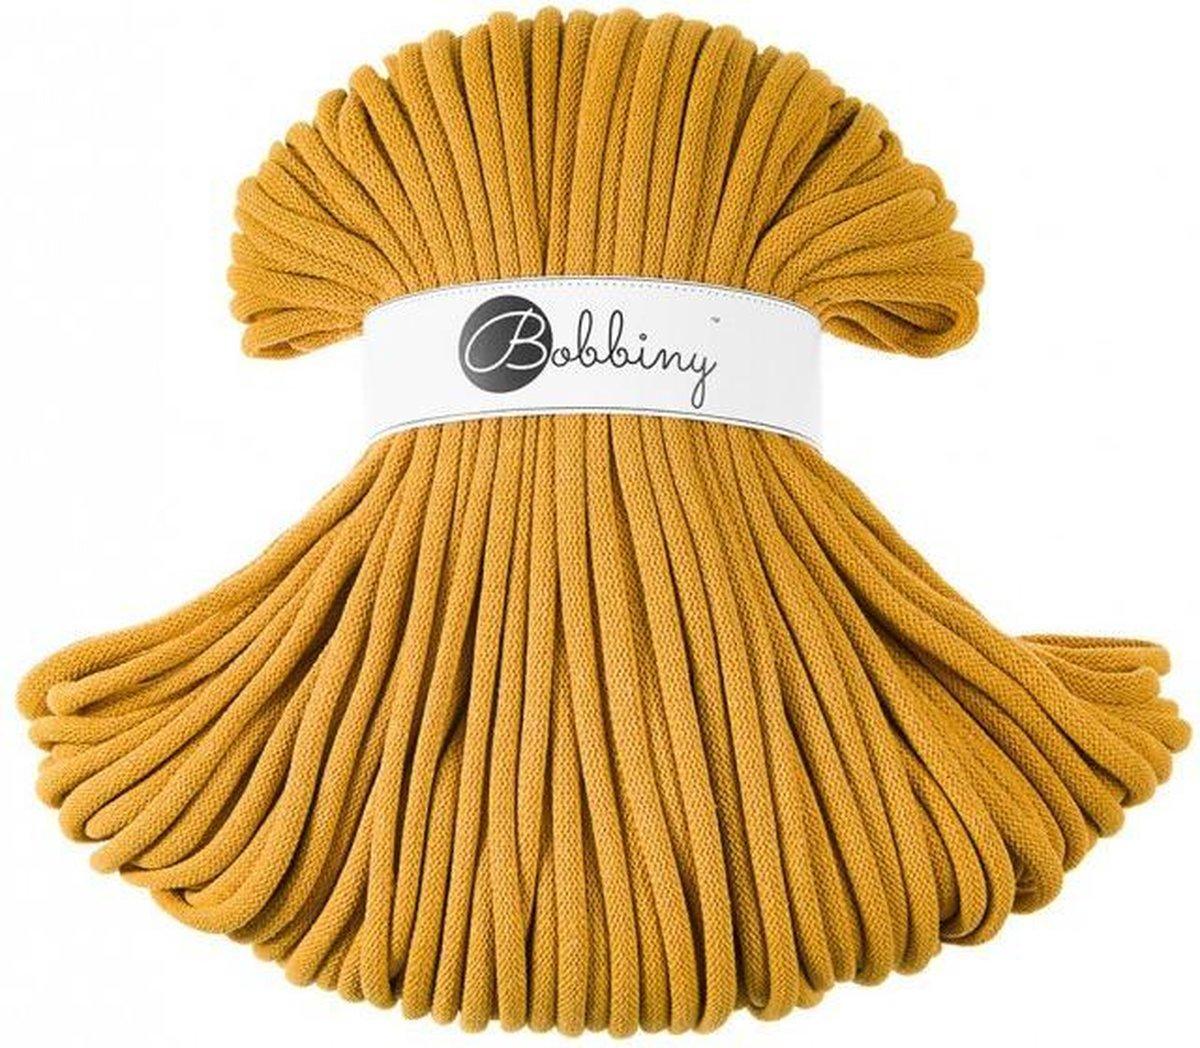 Bobbiny Jumbo Cord 9mm Mustard